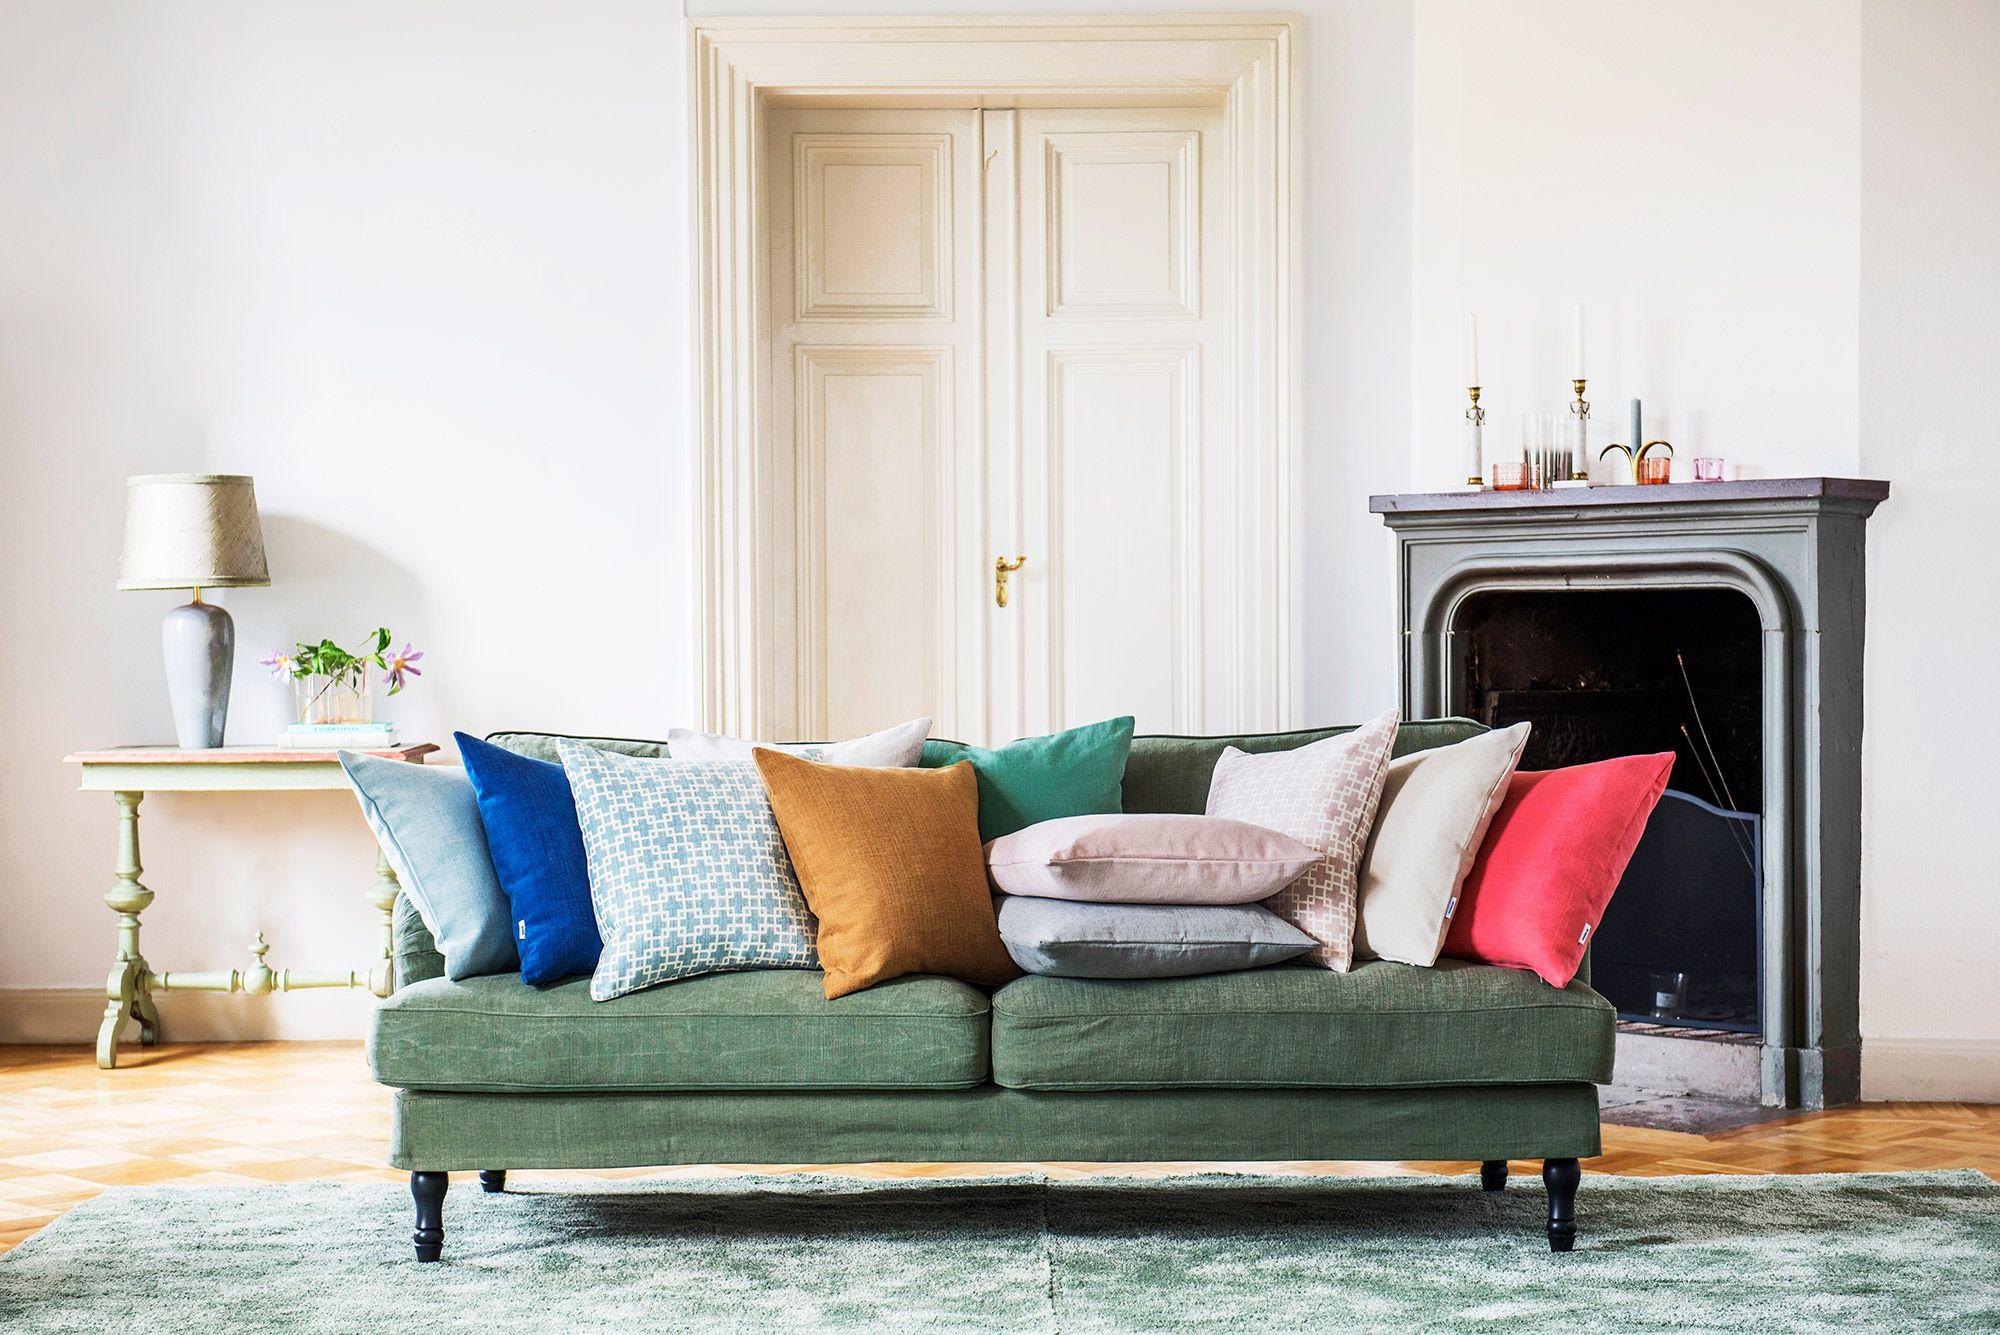 An eclectic mix scatter cushions en masse Green sofa